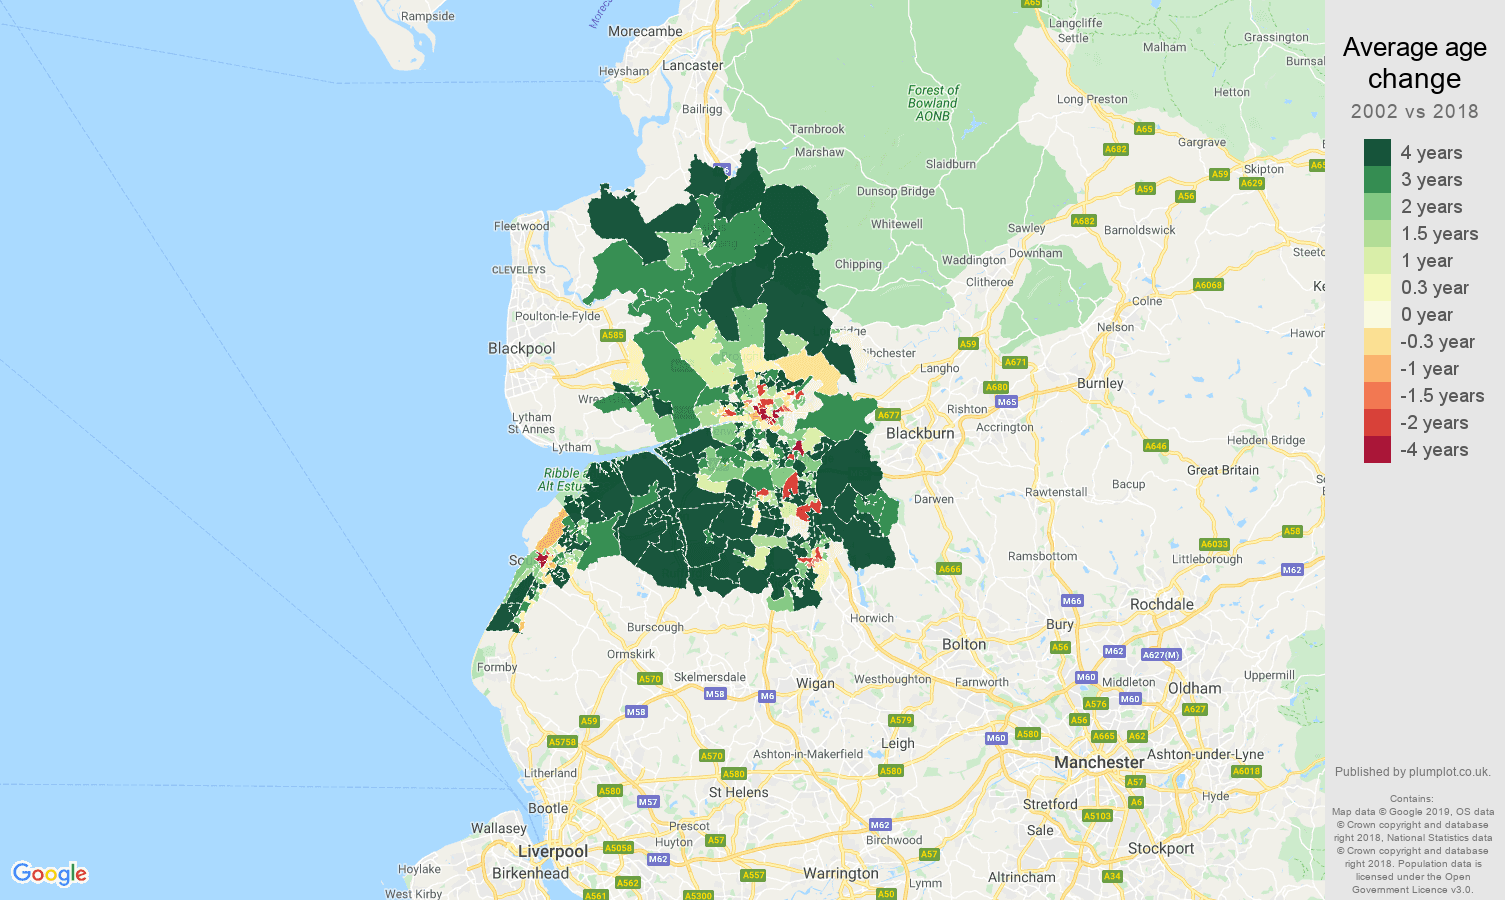 Preston average age change map